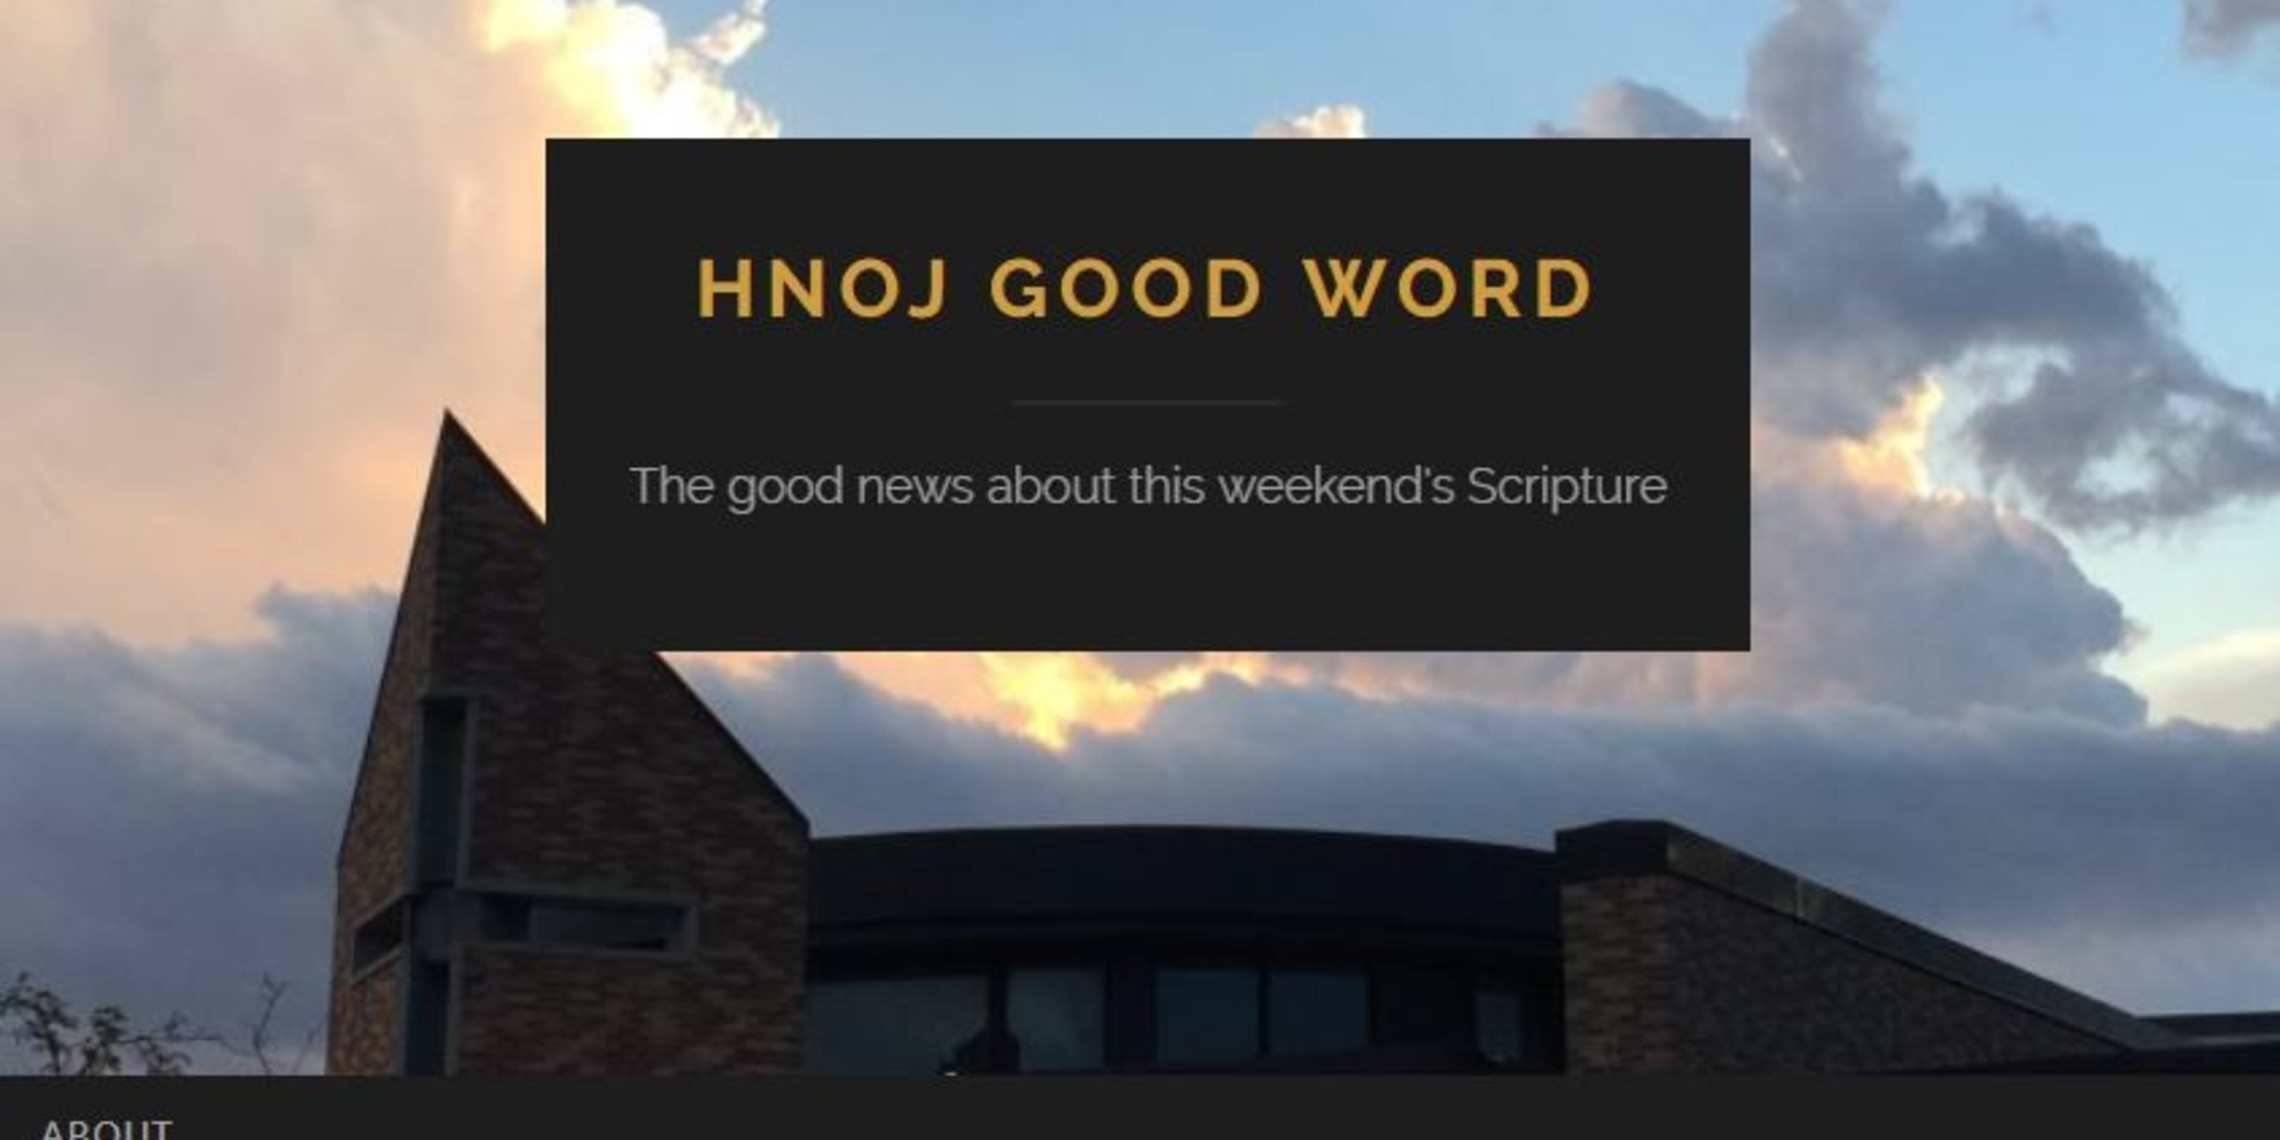 HNOJ Good Word